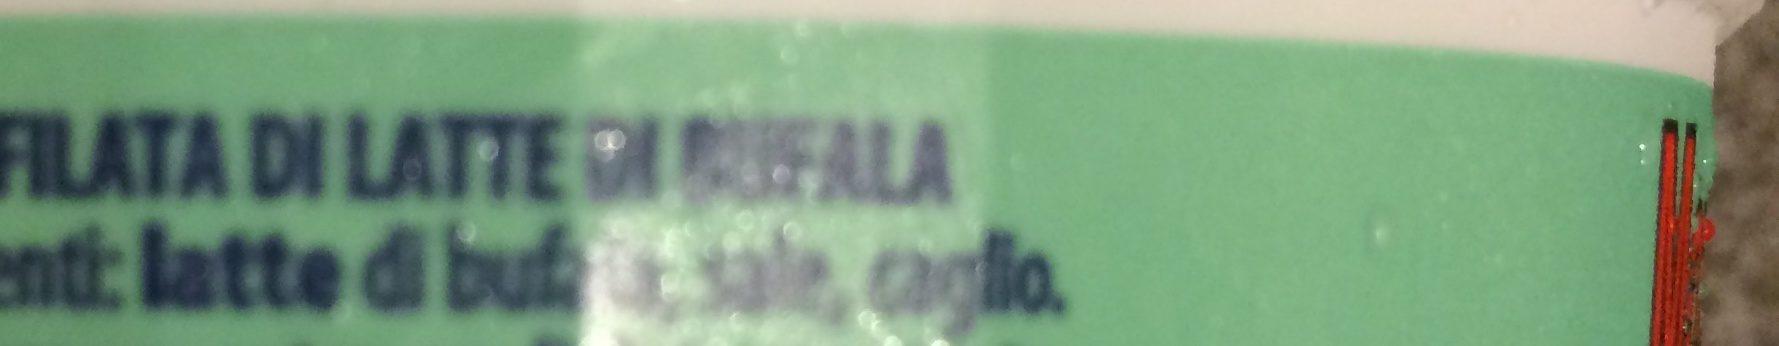 Mozzarella di bufala campana - Ingredients